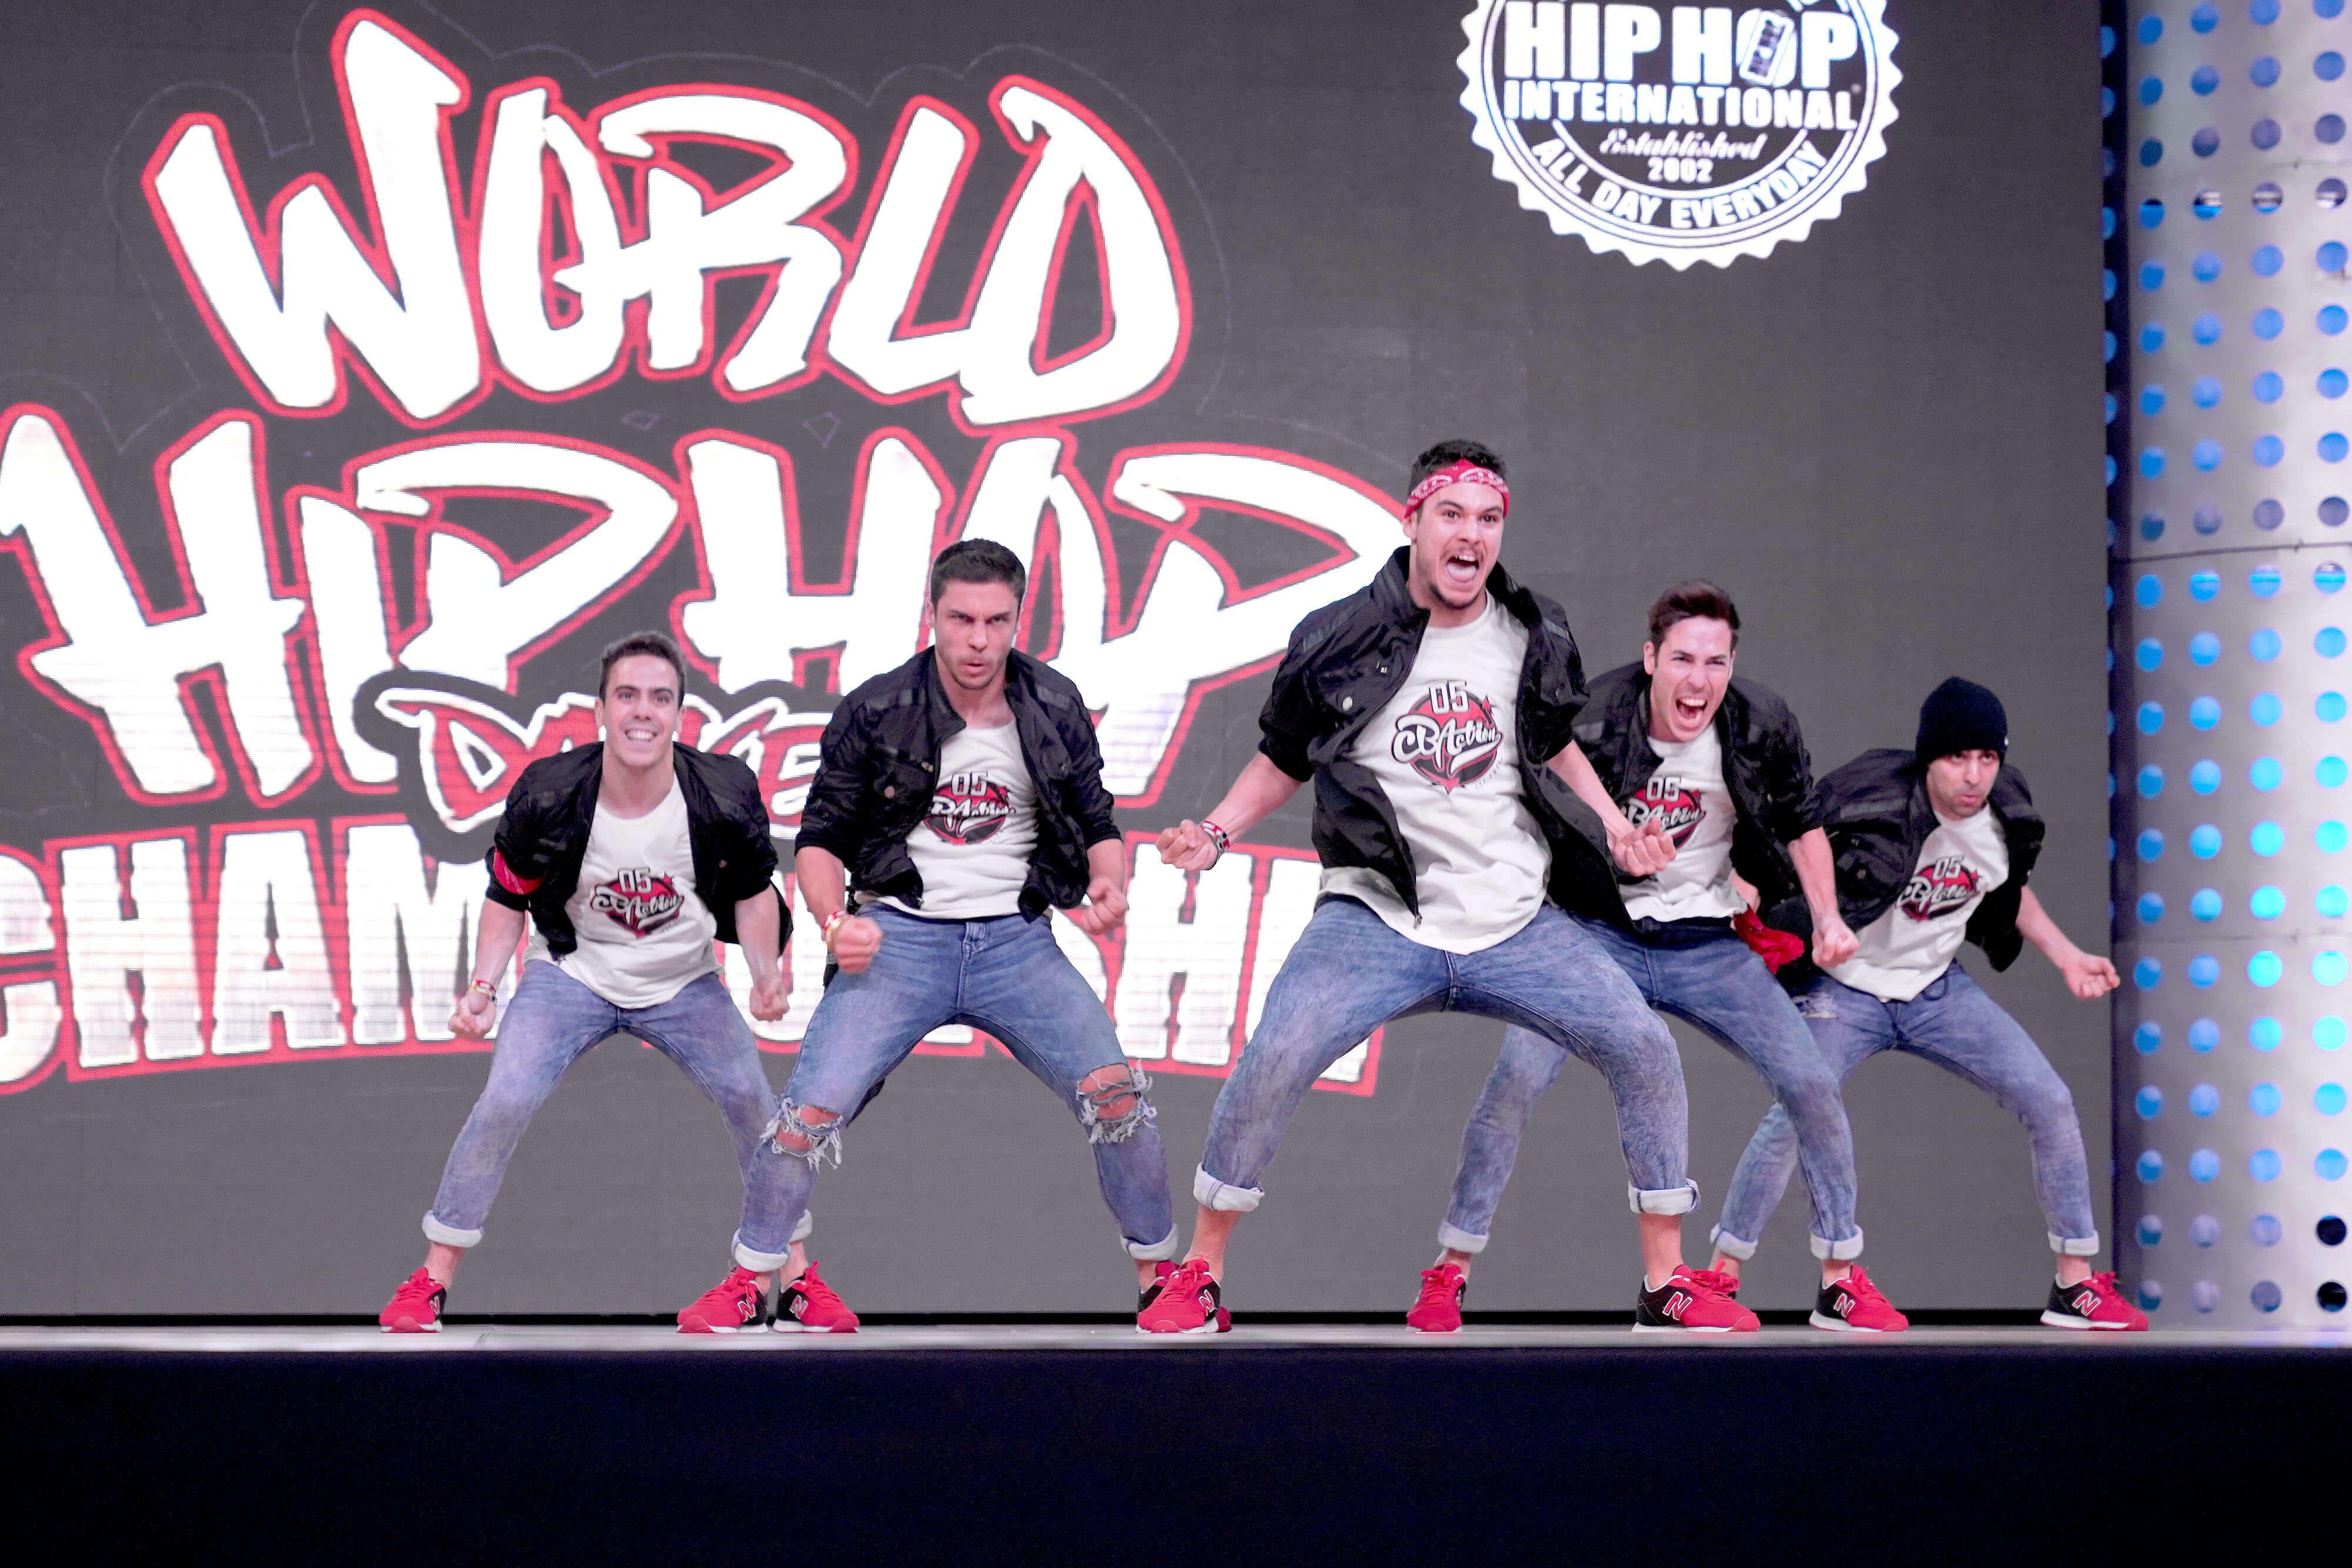 Hip Hop International Uniting The World Through Dance Oregon Jewish Life